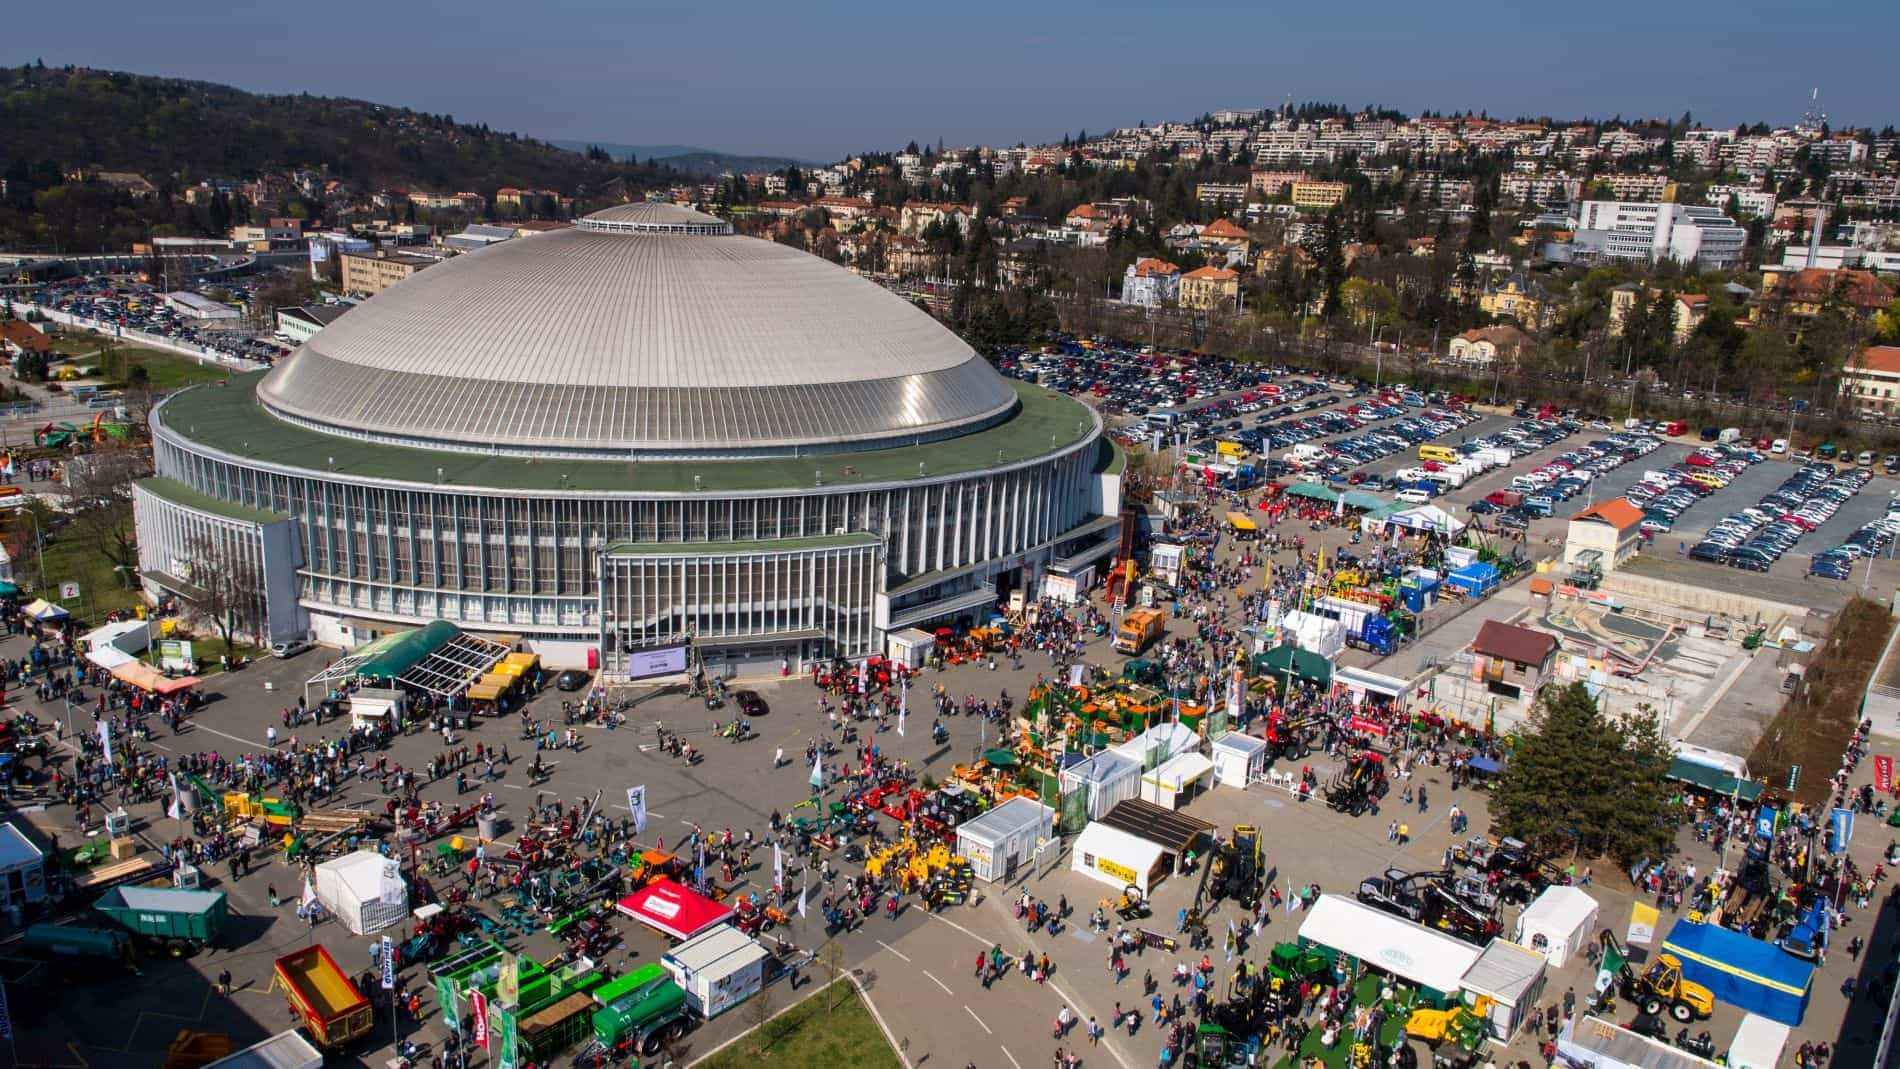 Pavilion Z - BRNO'S EXHIBITION GROUNDS in Brno